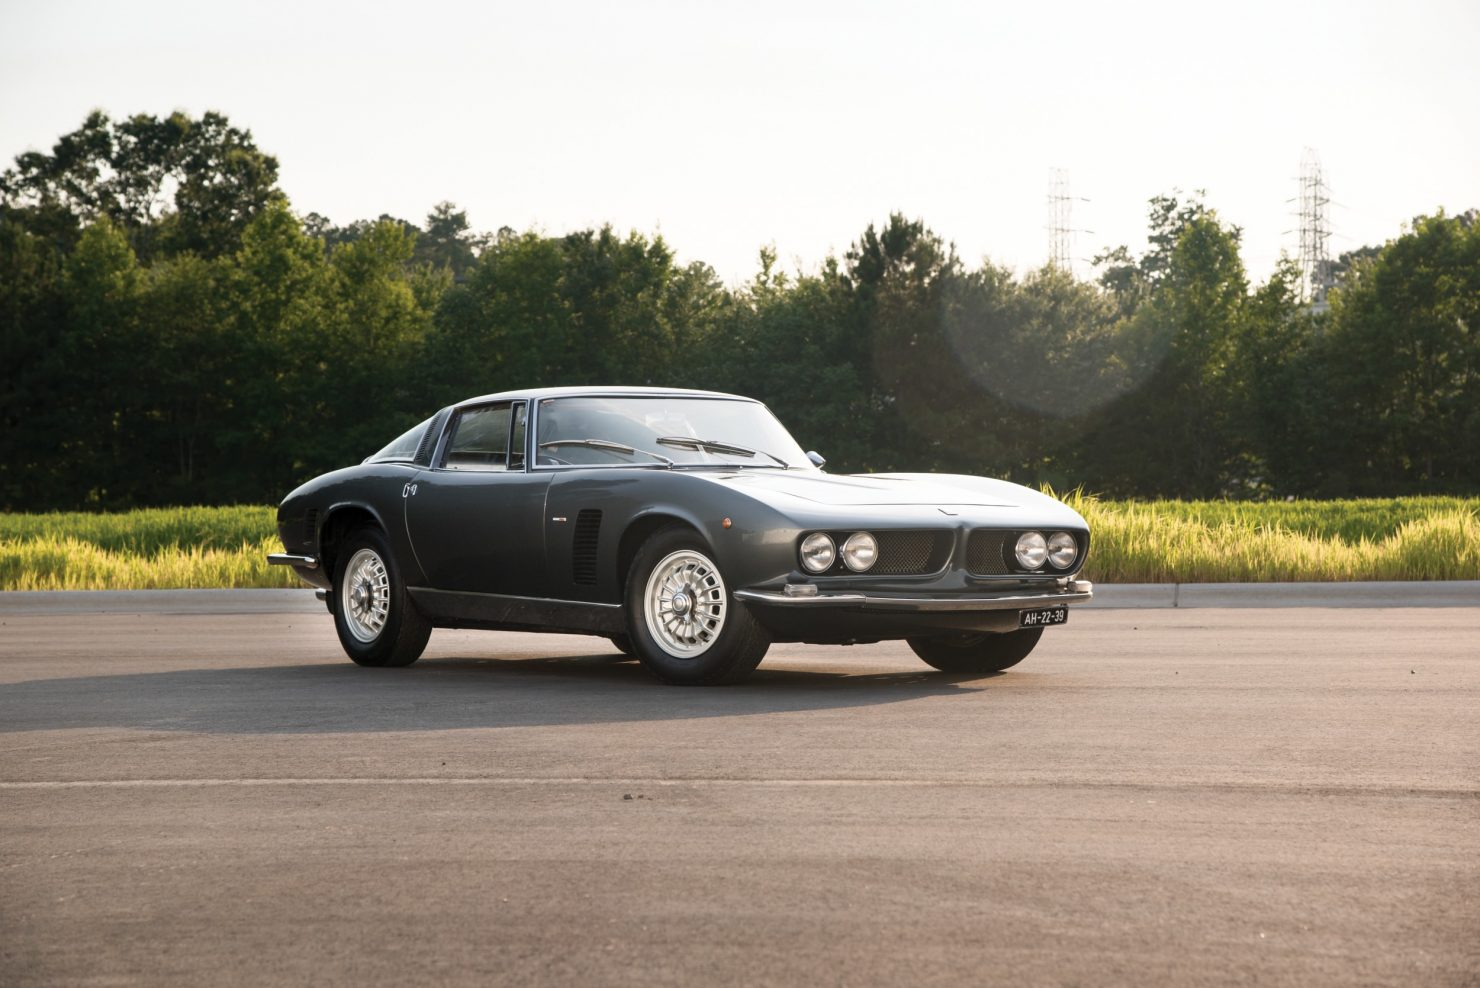 iso grifo car 1 1480x988 - 1966 Iso Grifo GL Series I